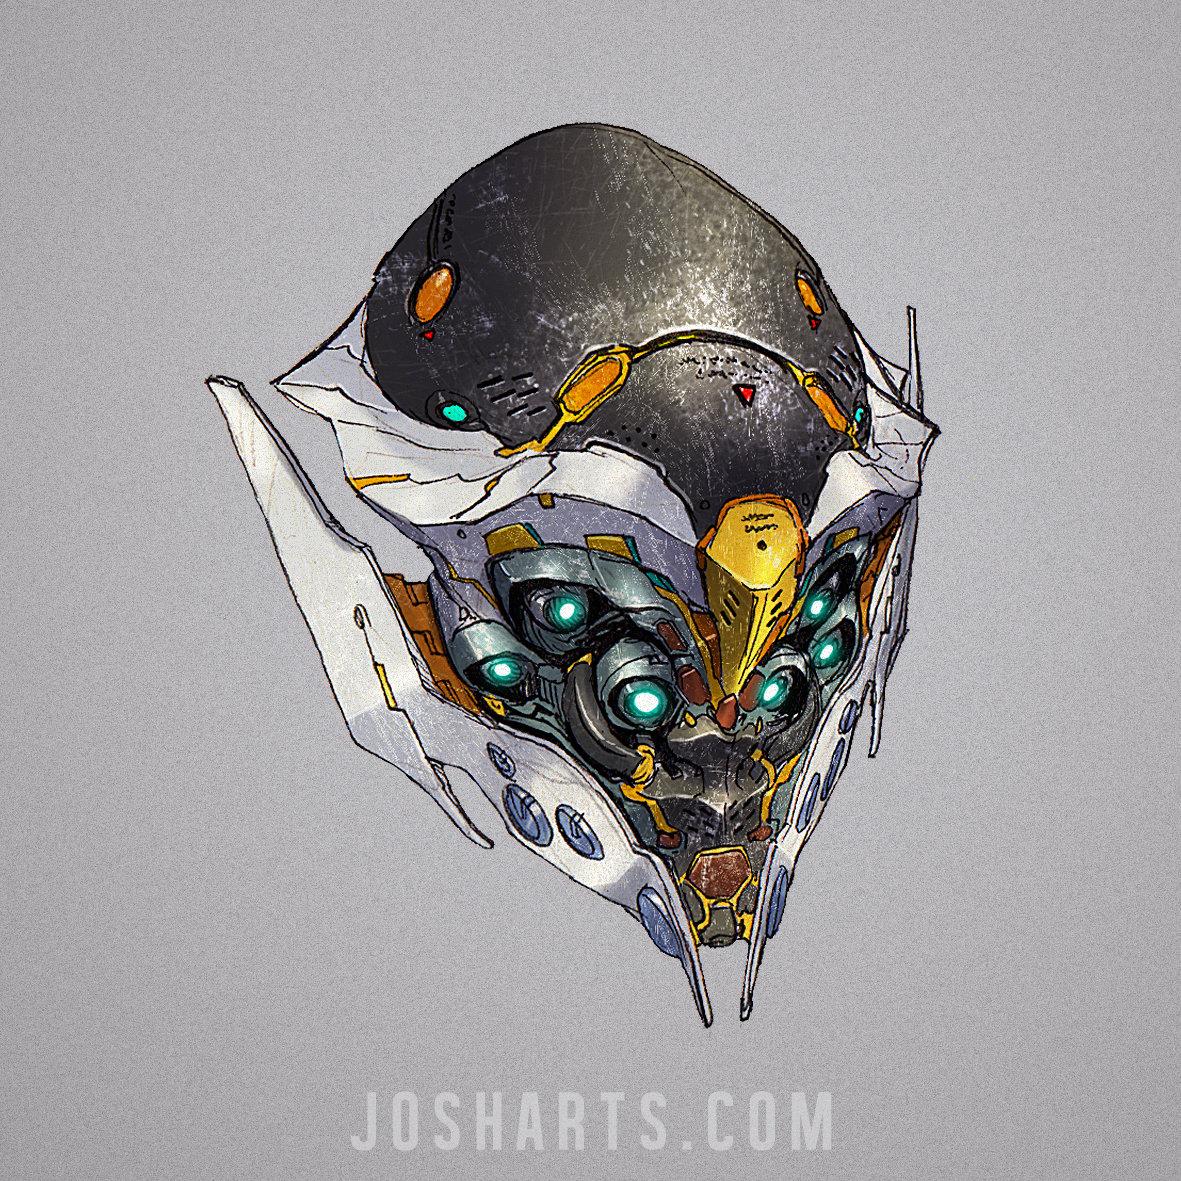 Josh matts sketch 12 h1